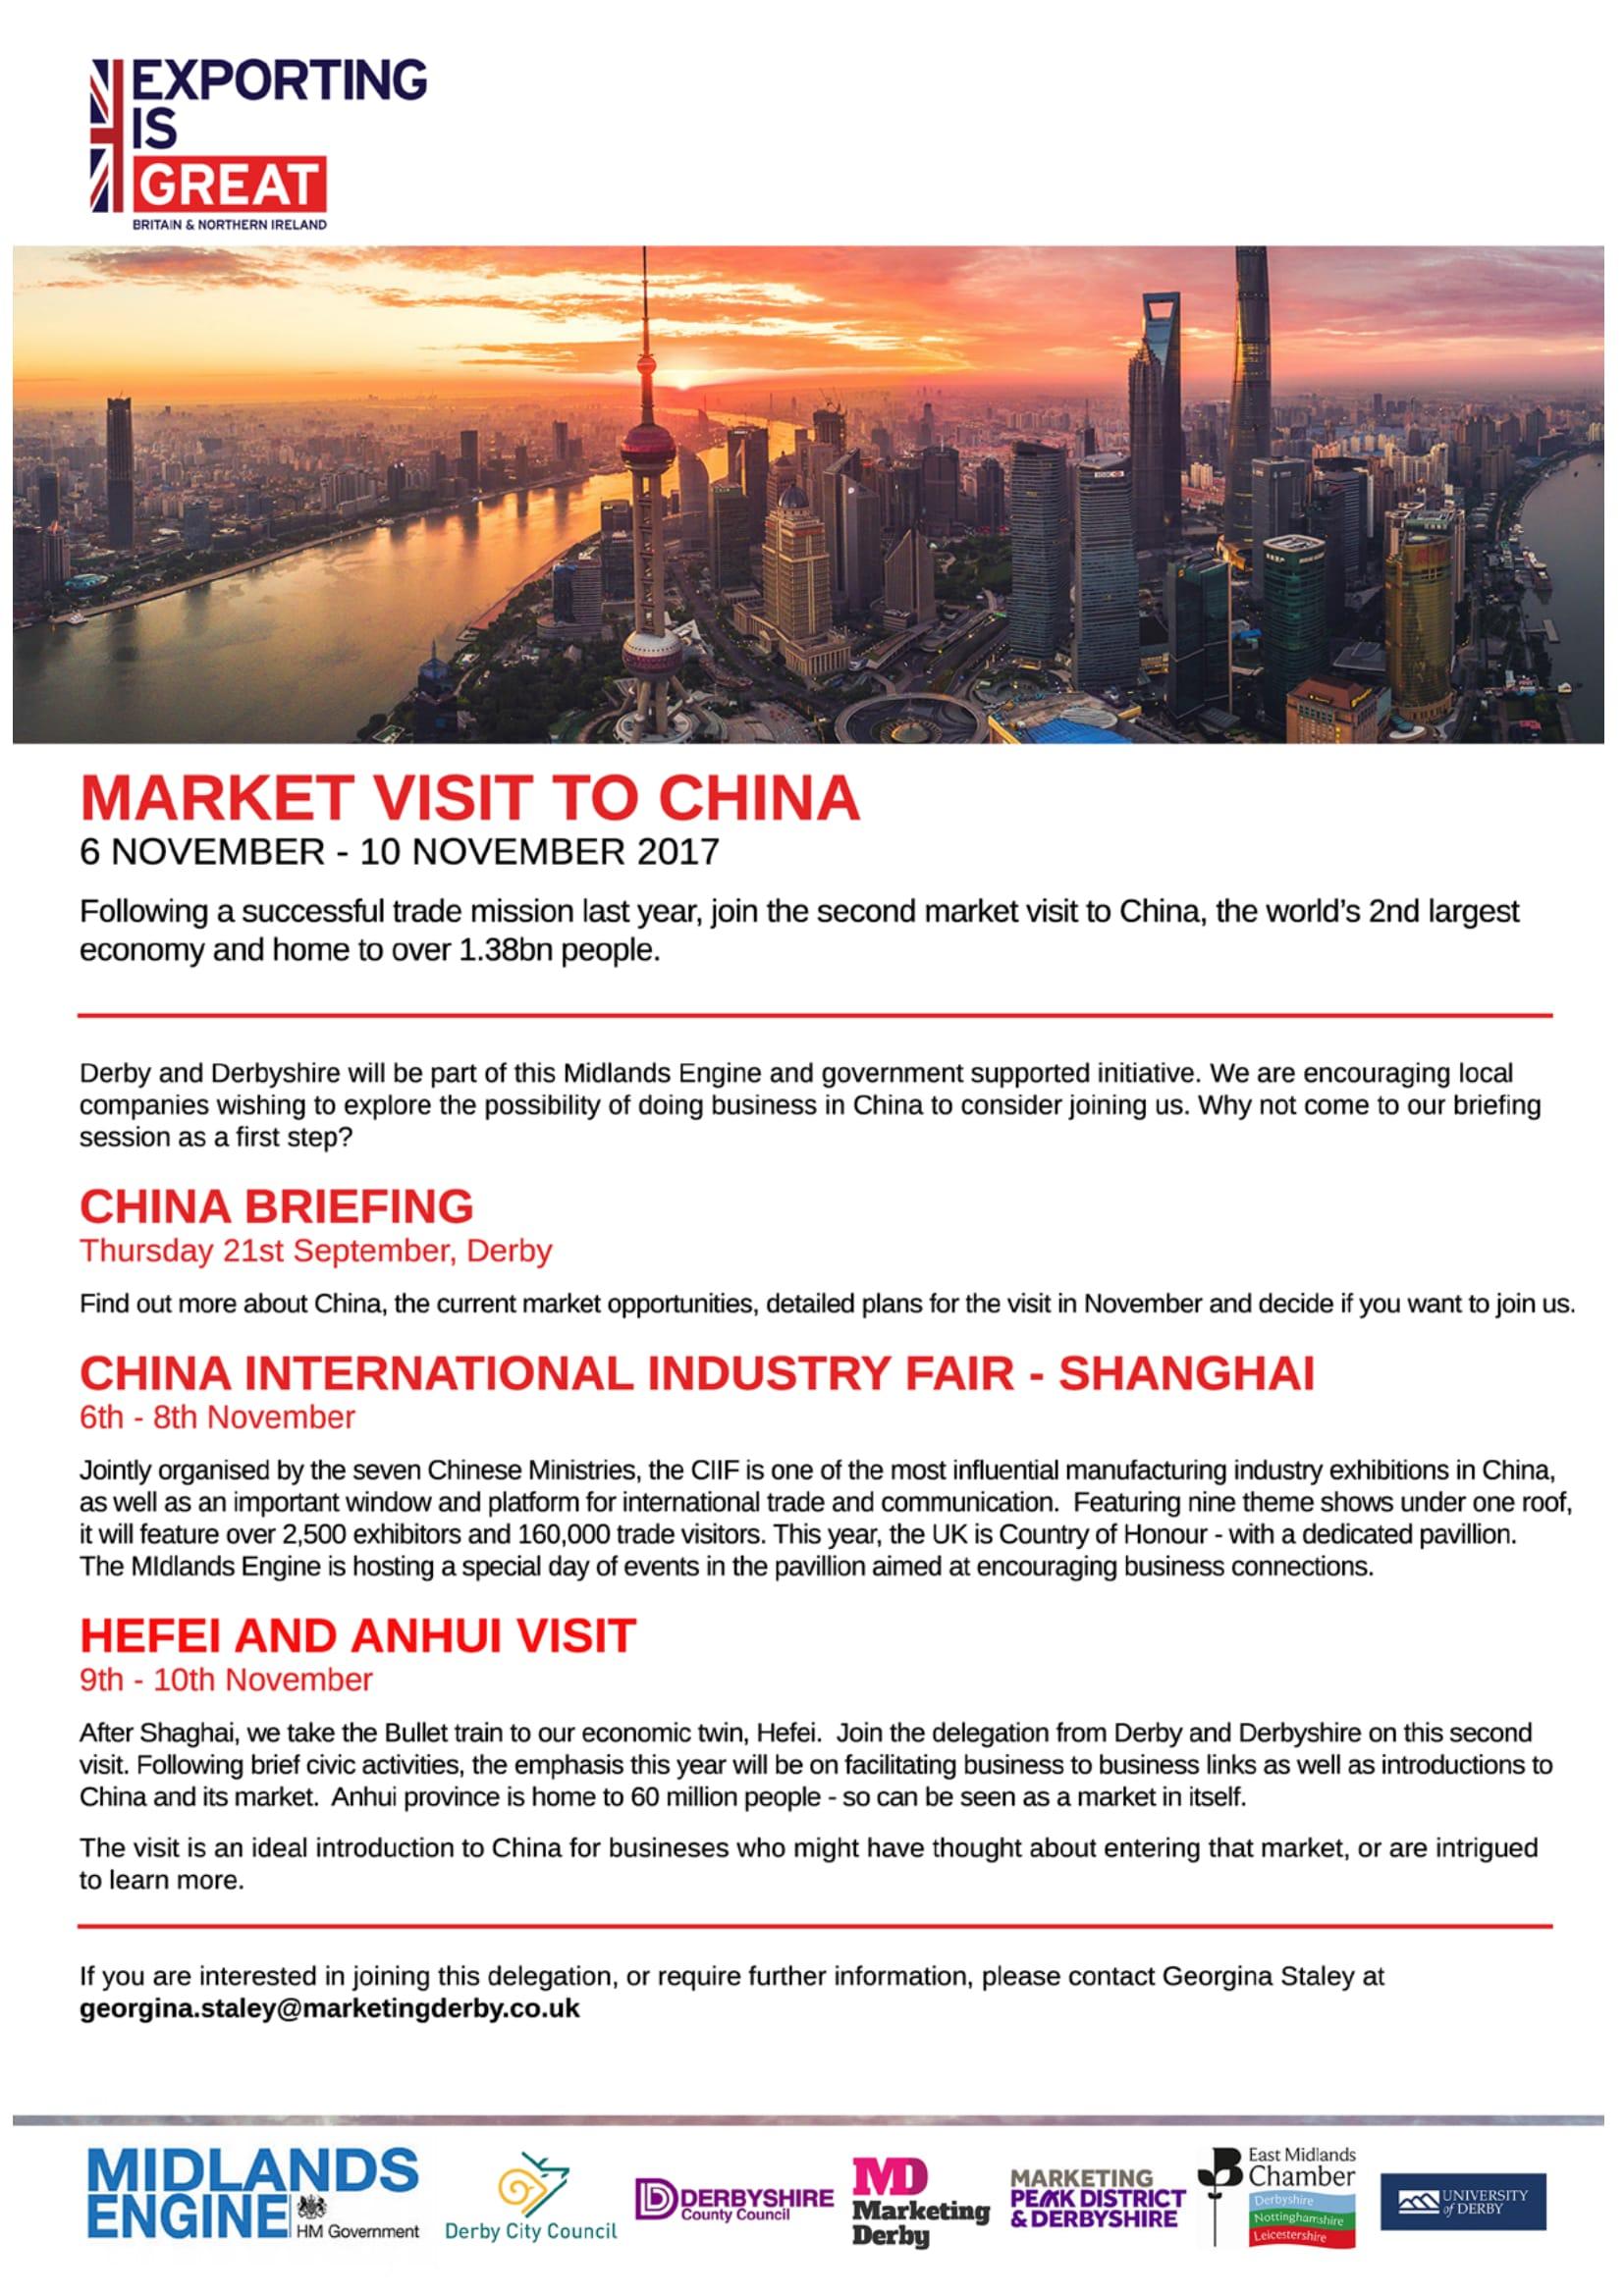 Chinese Midlands Engine Visit Invitation (1)-1.jpg